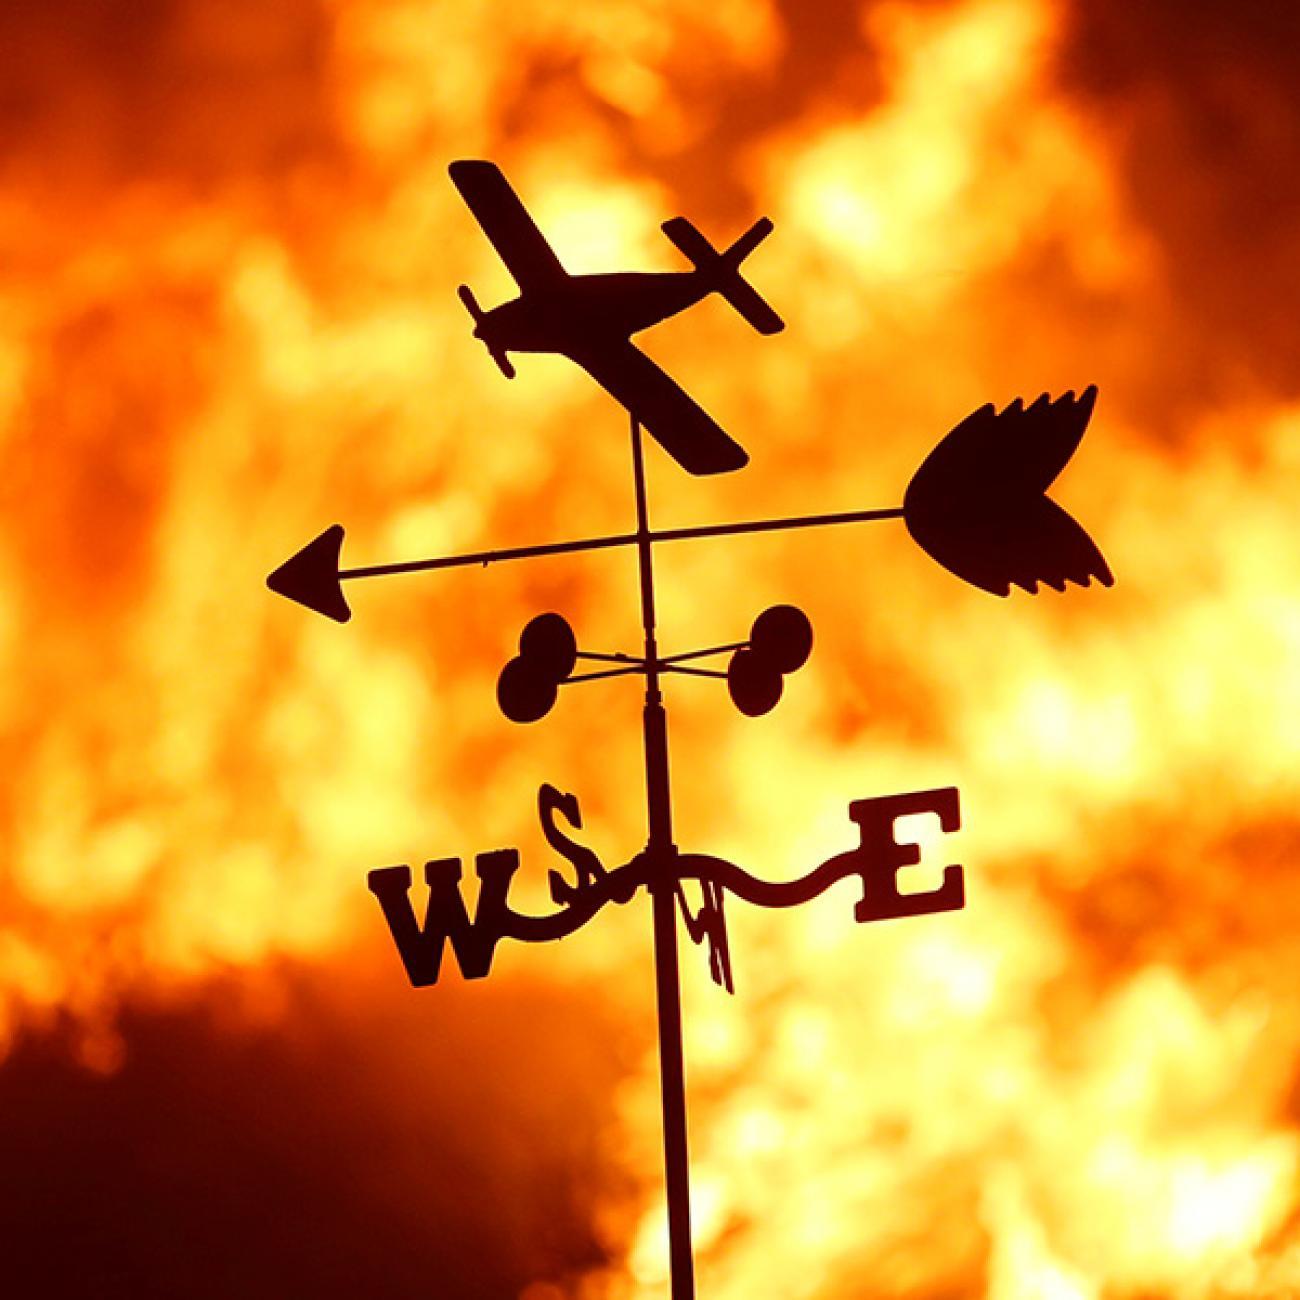 https://www.thinkglobalhealth.org/sites/default/files/styles/max_1300x1300_1_1/public/2020-01/CT-Wildfire-Vane-RTX3LYYB-SQUARE.jpg?itok=wJdJJGq9